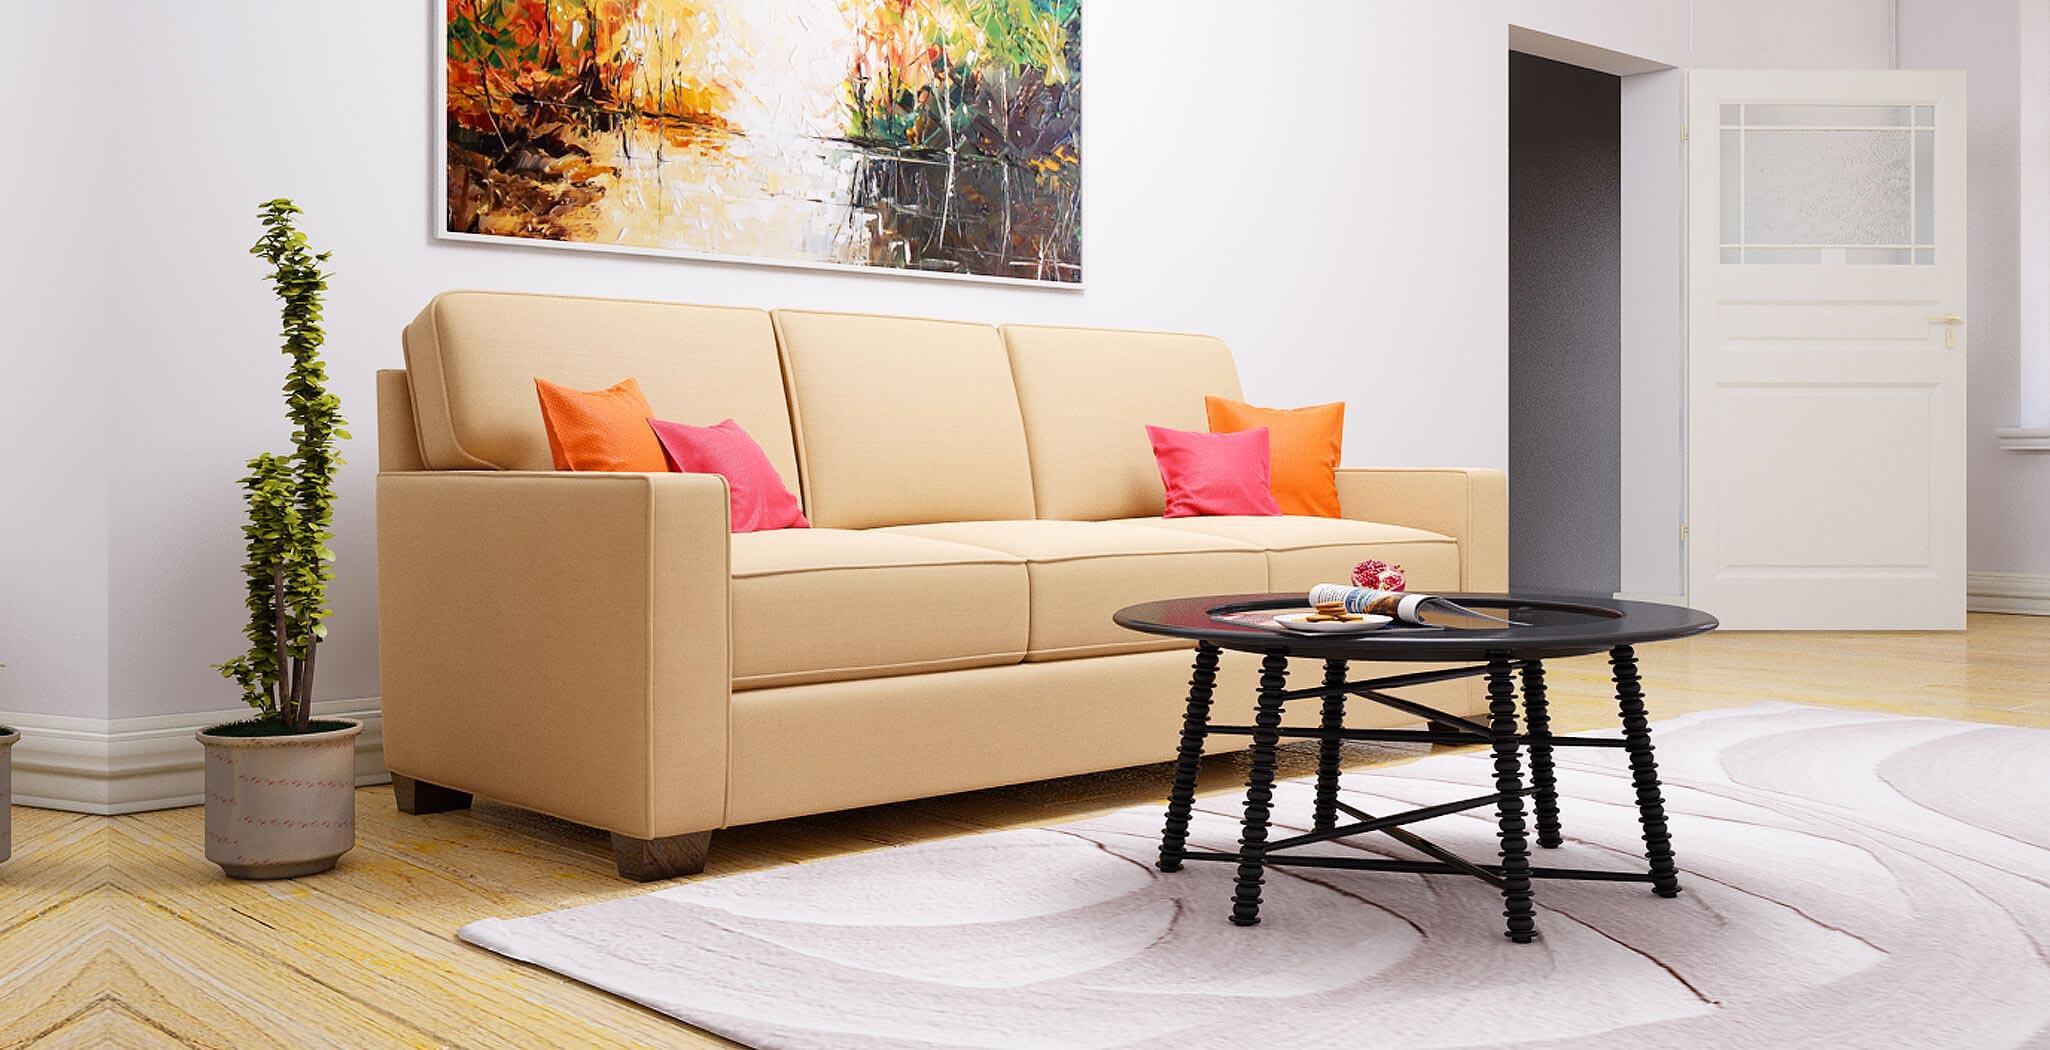 chicago sofa furniture gallery 4